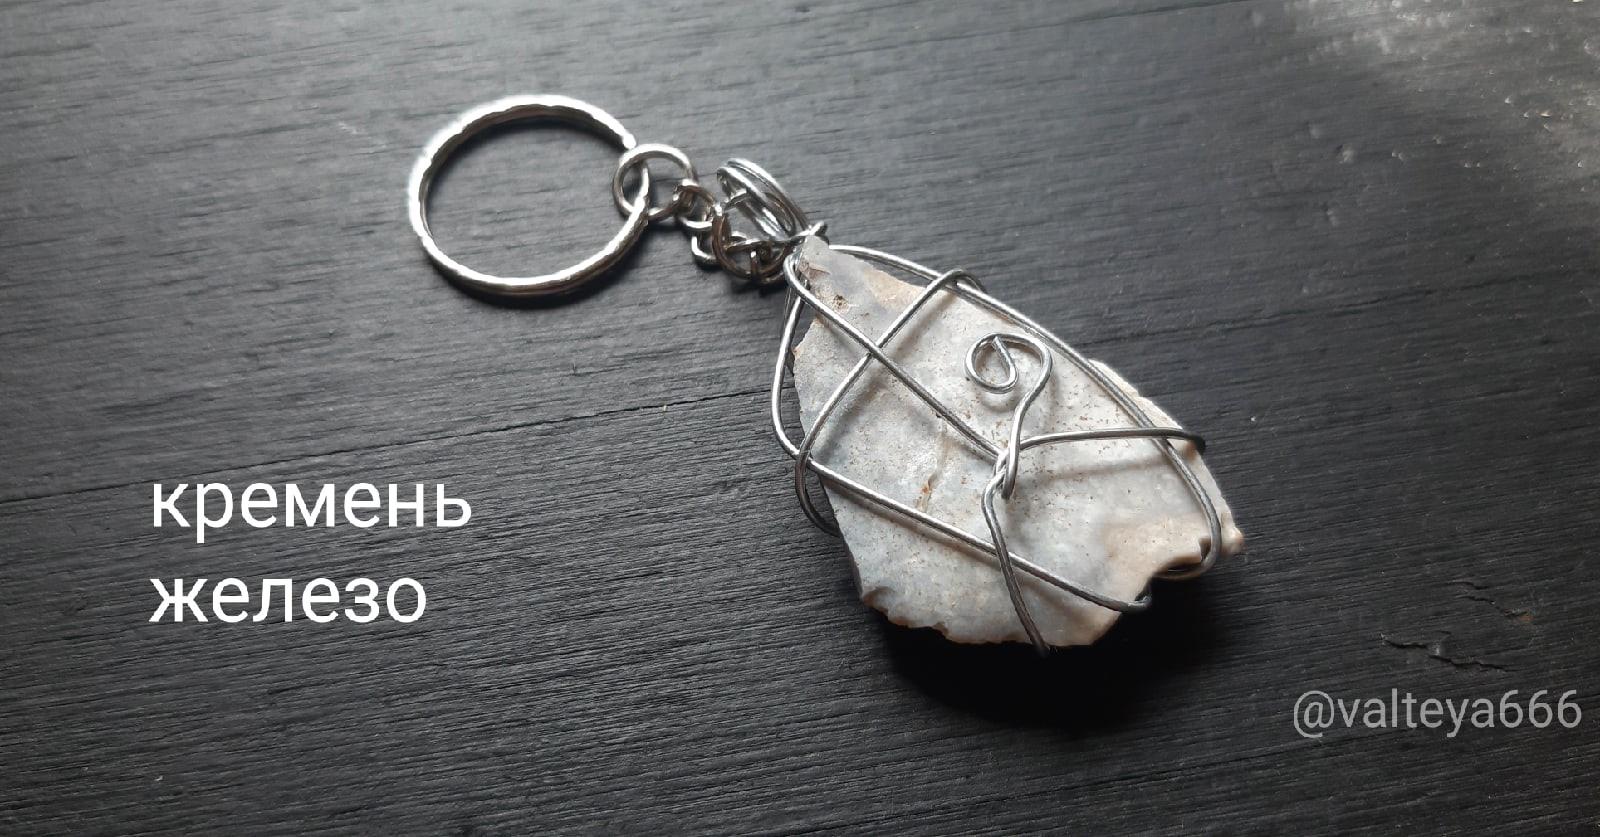 Украина - Натуальные камни. Талисманы, амулеты из натуральных камней - Страница 3 -J1997pEq24